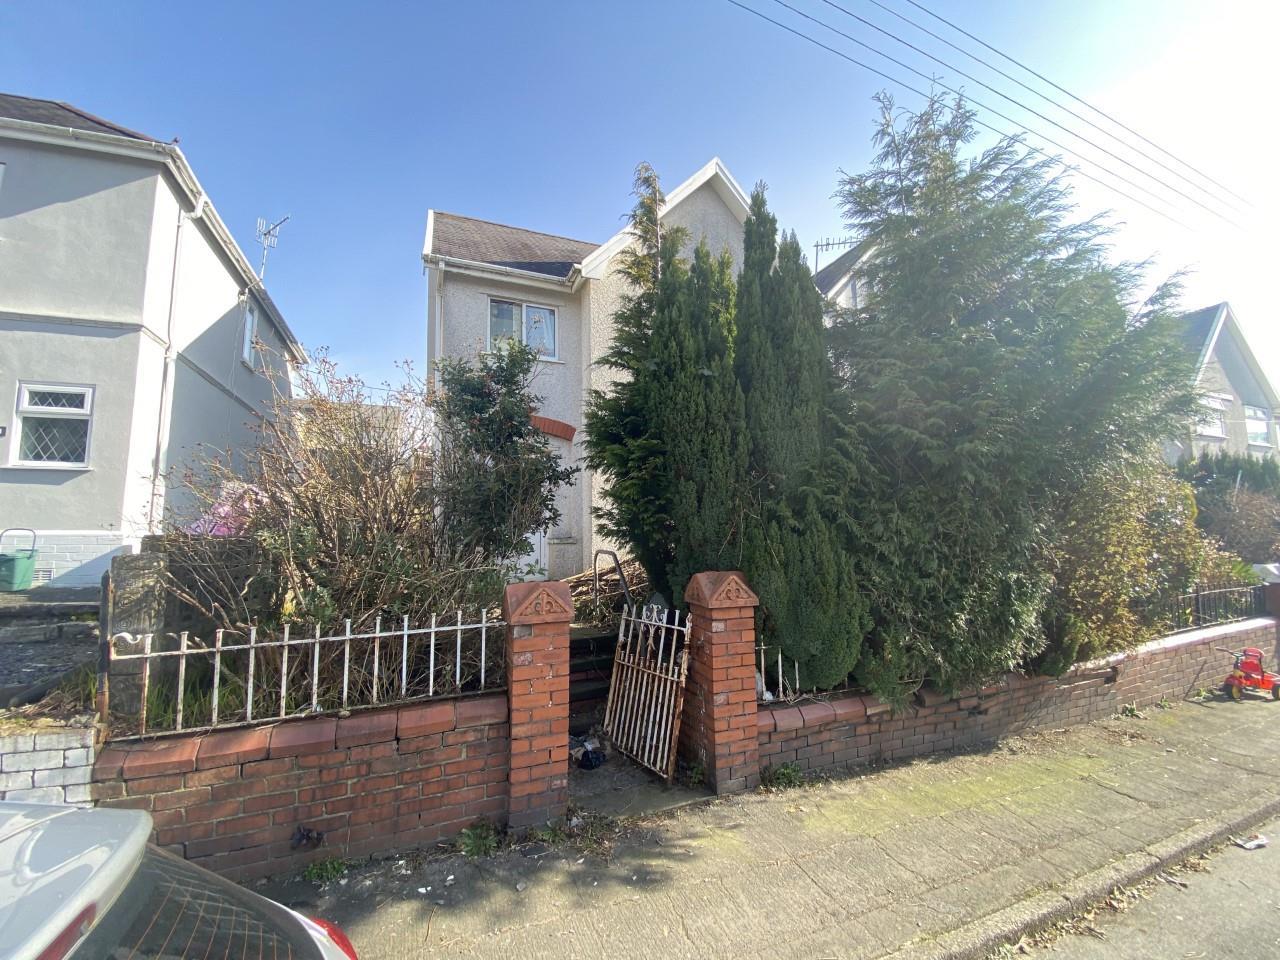 Kelvin Road, Clydach, Swansea, SA6 5JP